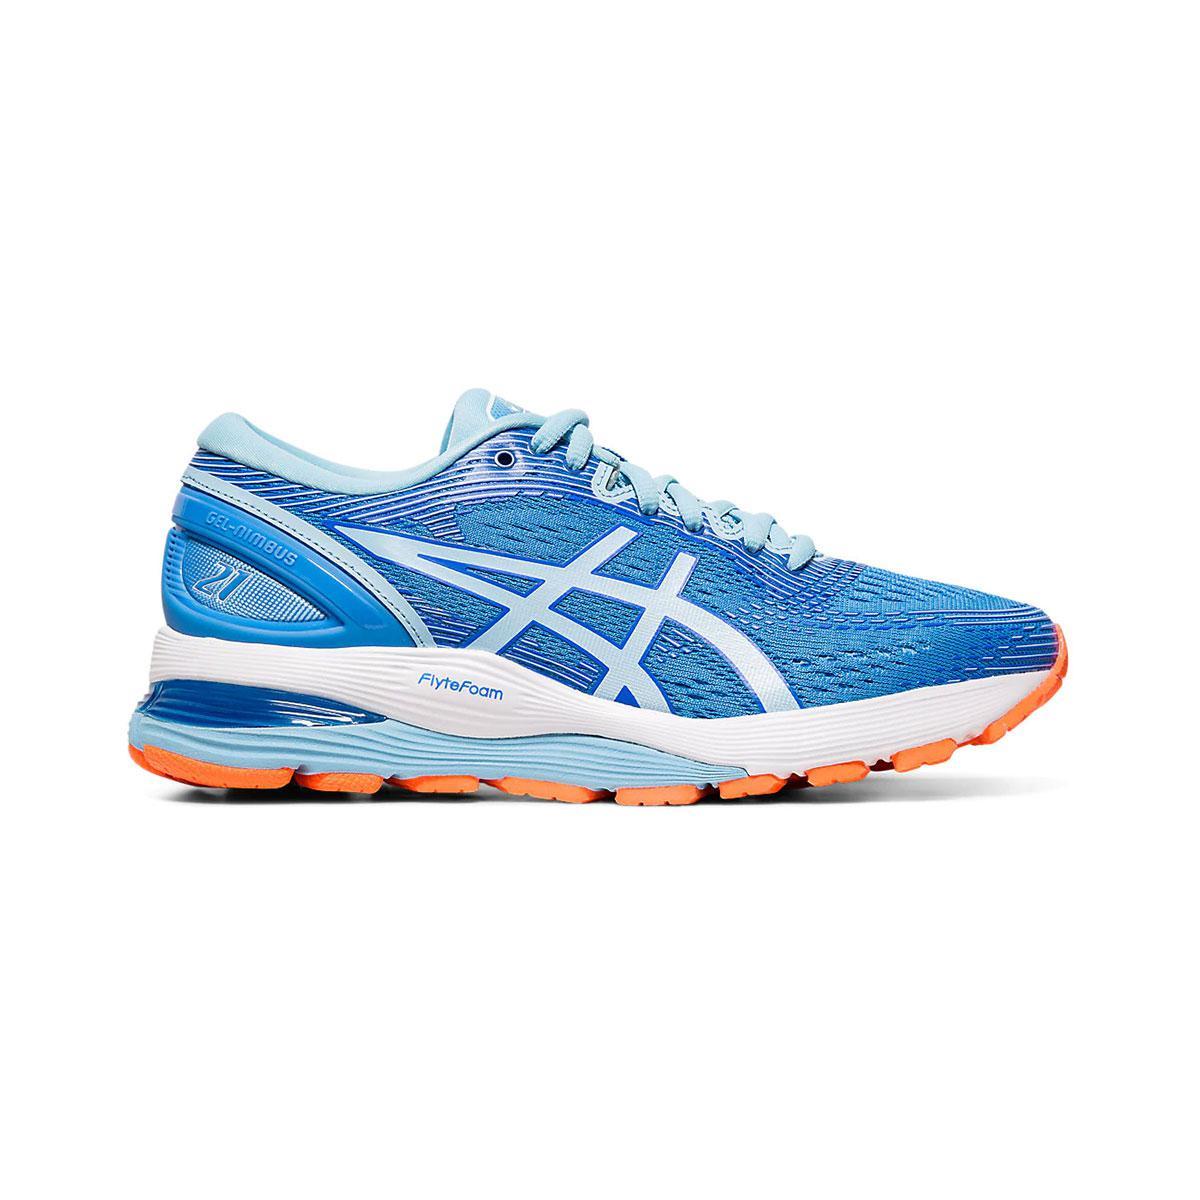 Asics Gel Nimbus 21 Wide Running Shoe